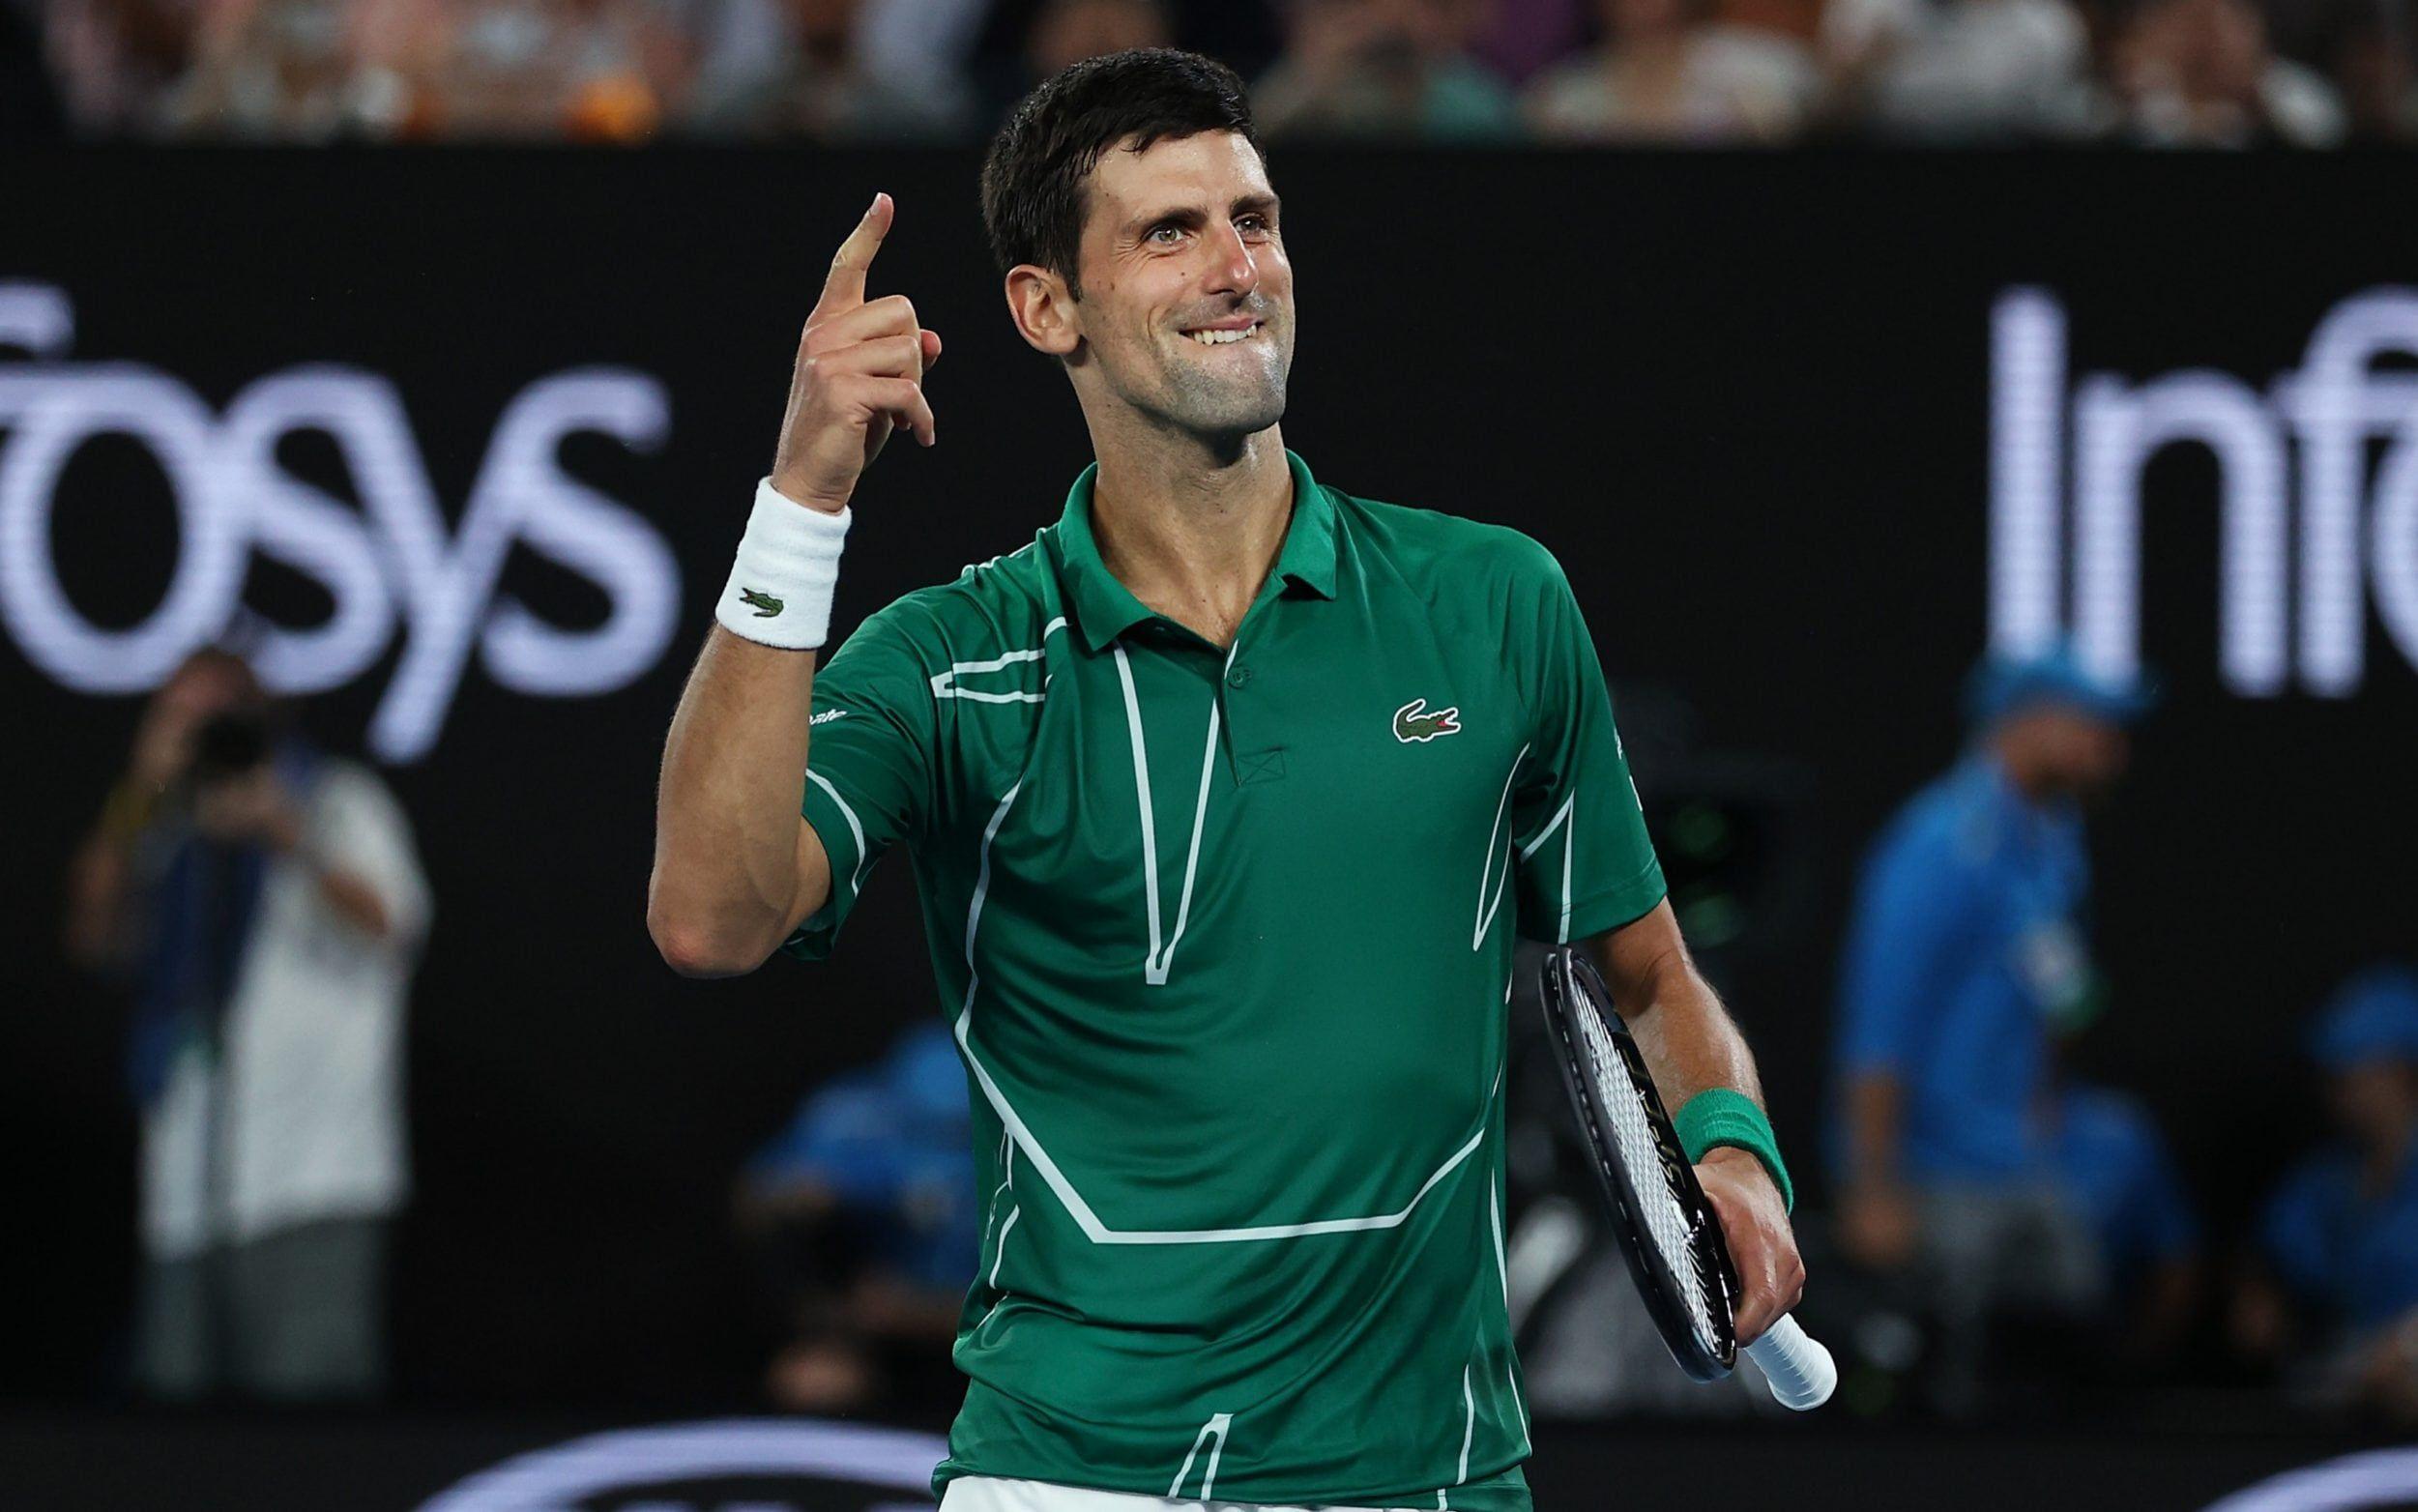 Novak Djokovic Reached To Finals After Defeating Roger Federer In Australian Open 2020 In 2020 Novak Djokovic Roger Federer Players